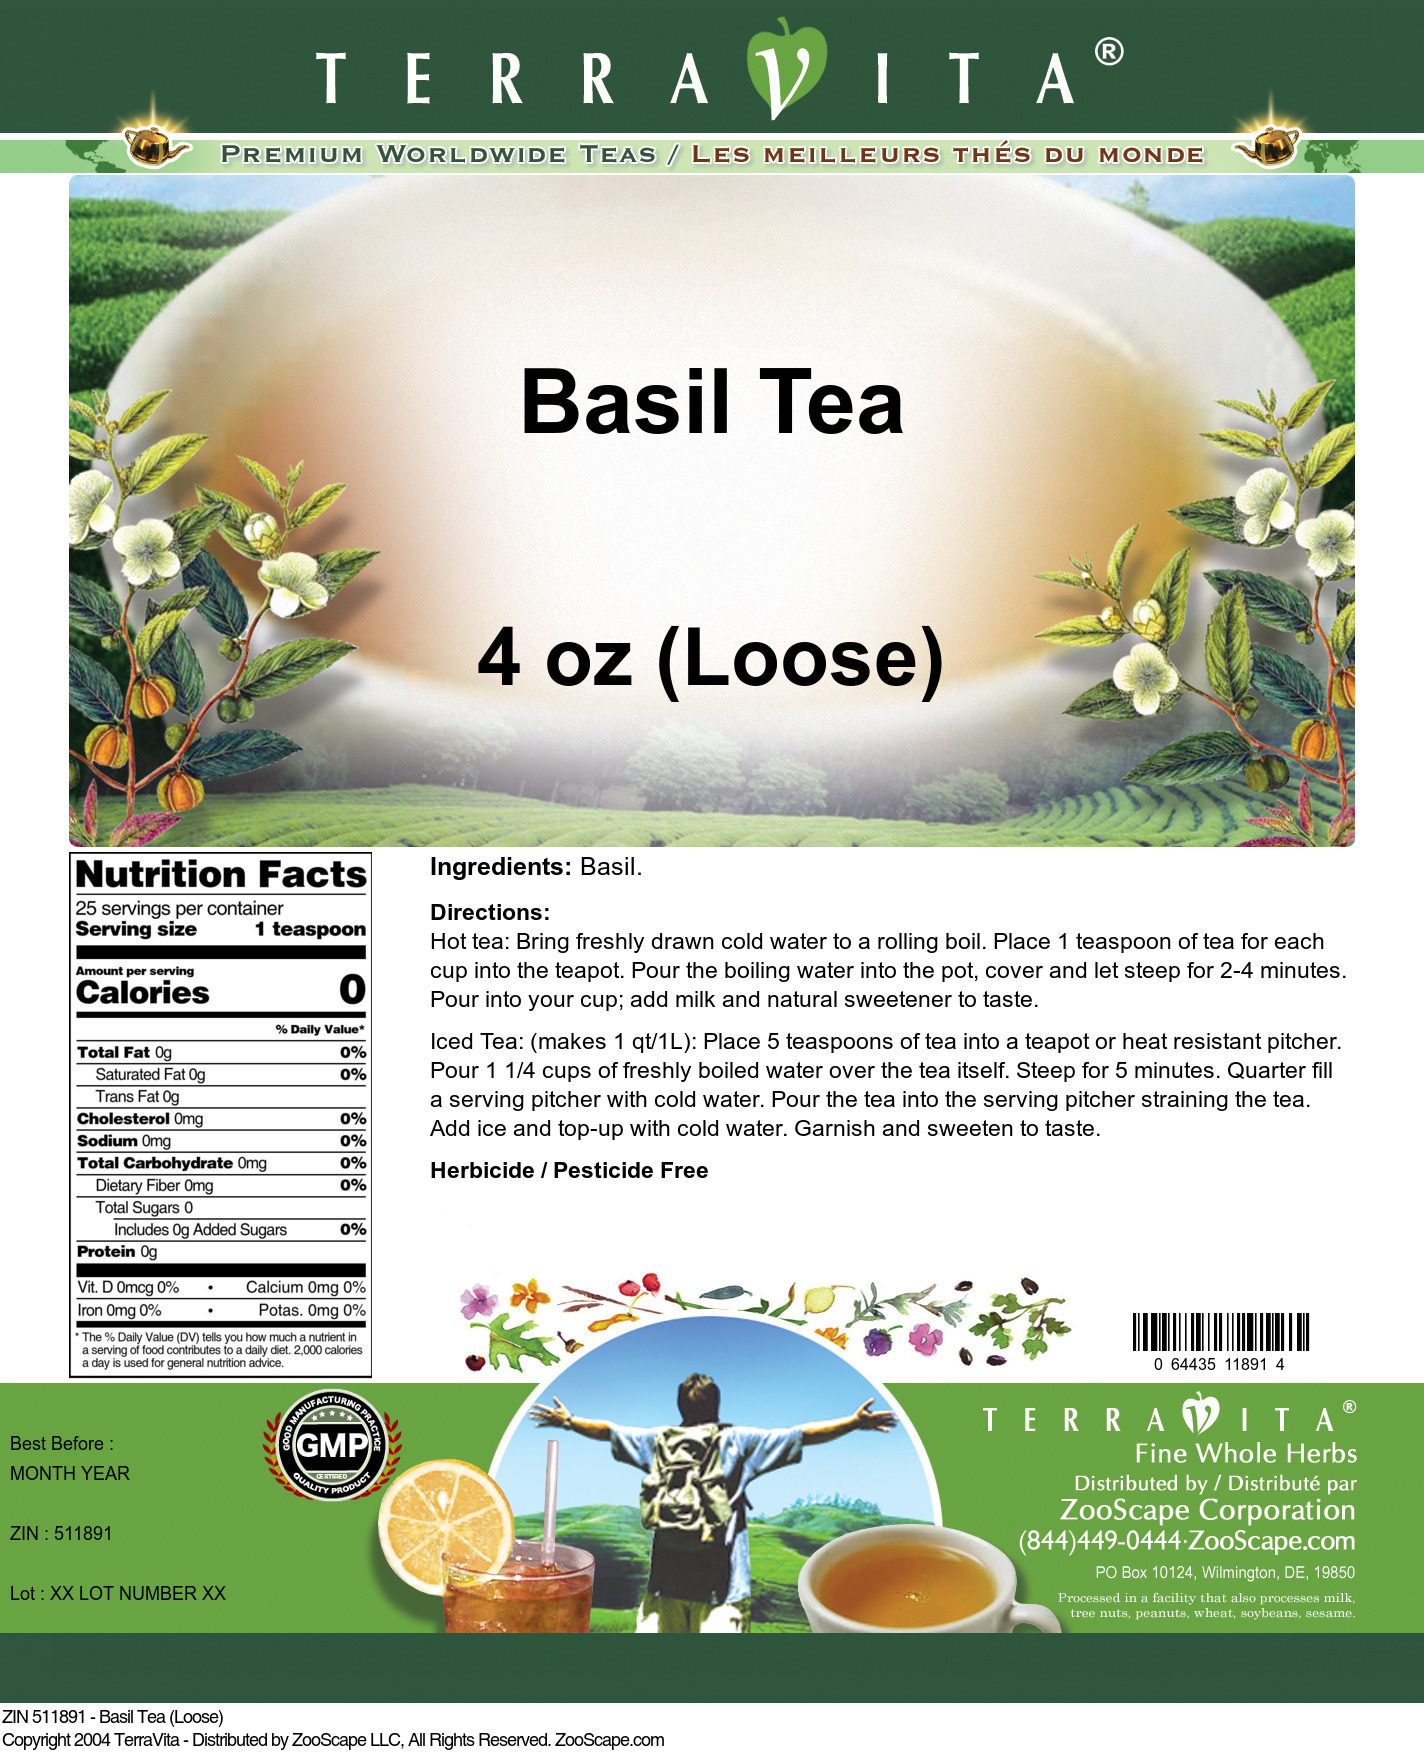 Basil Tea (Loose)